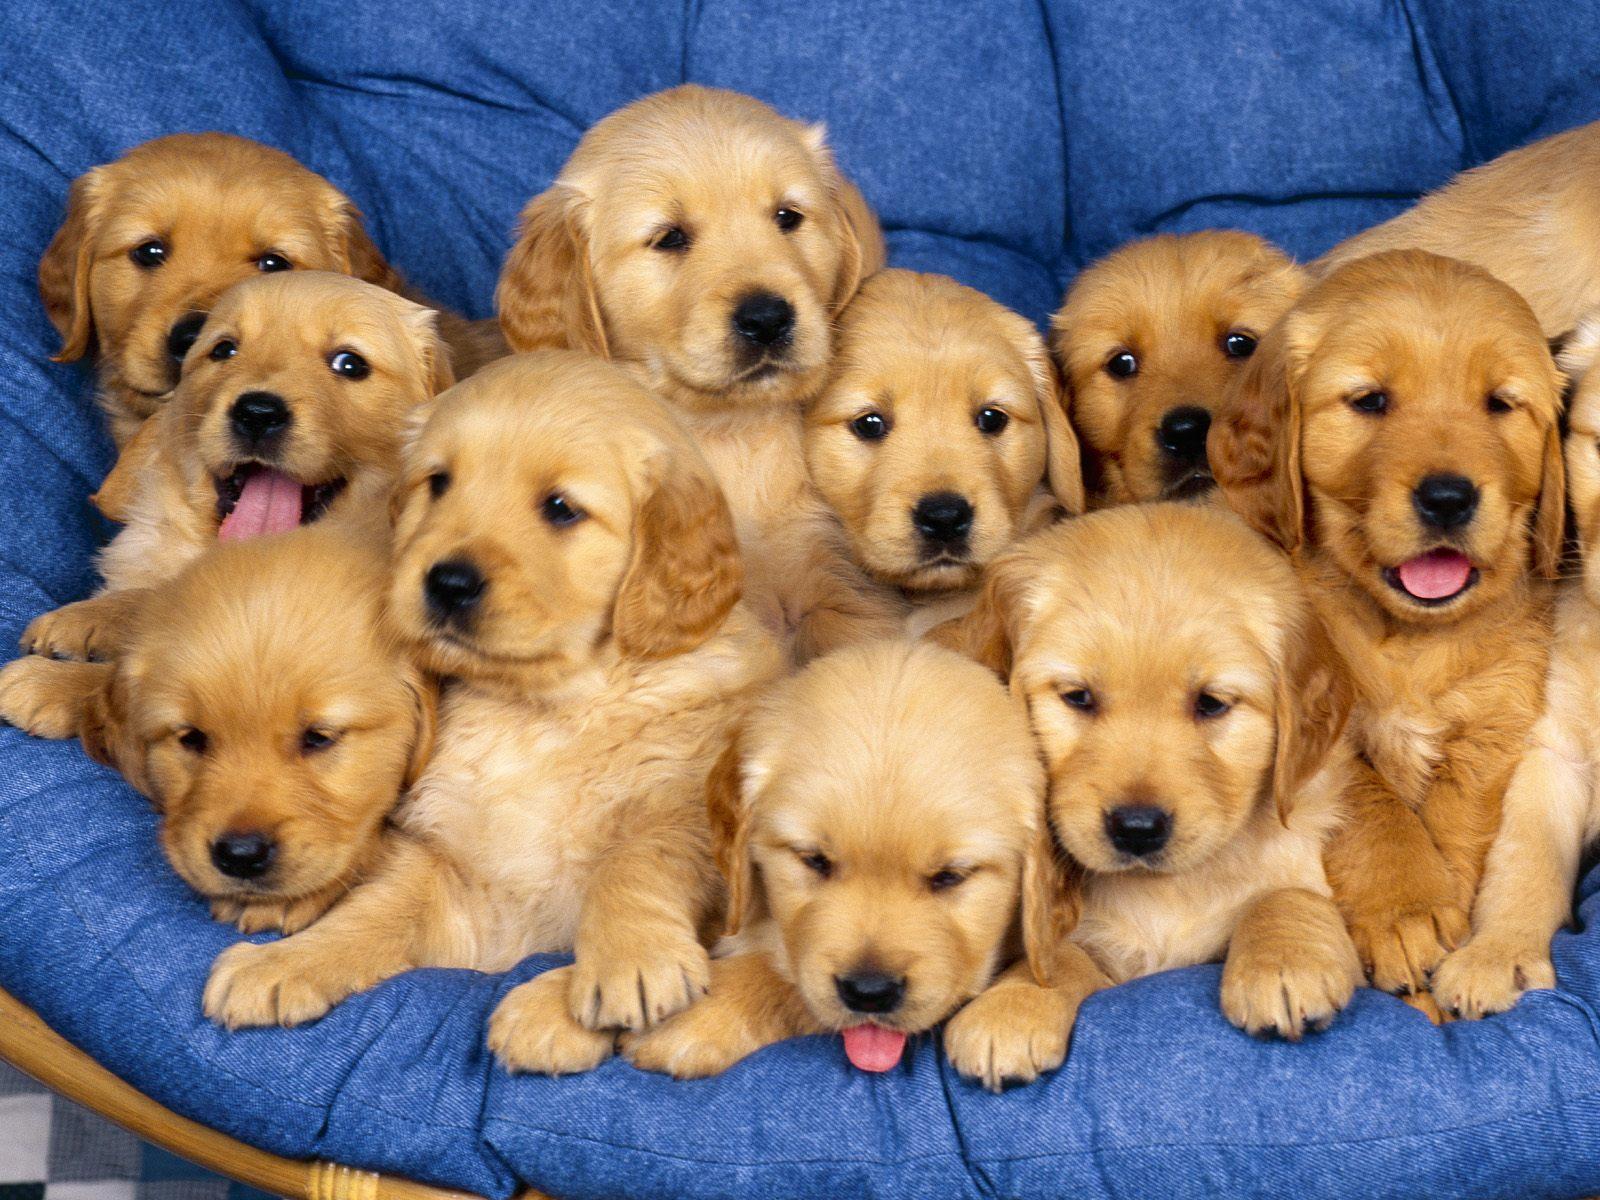 beautiful dog image cute puppies wallpapers dog hd wallpaper dog hd 1600x1200